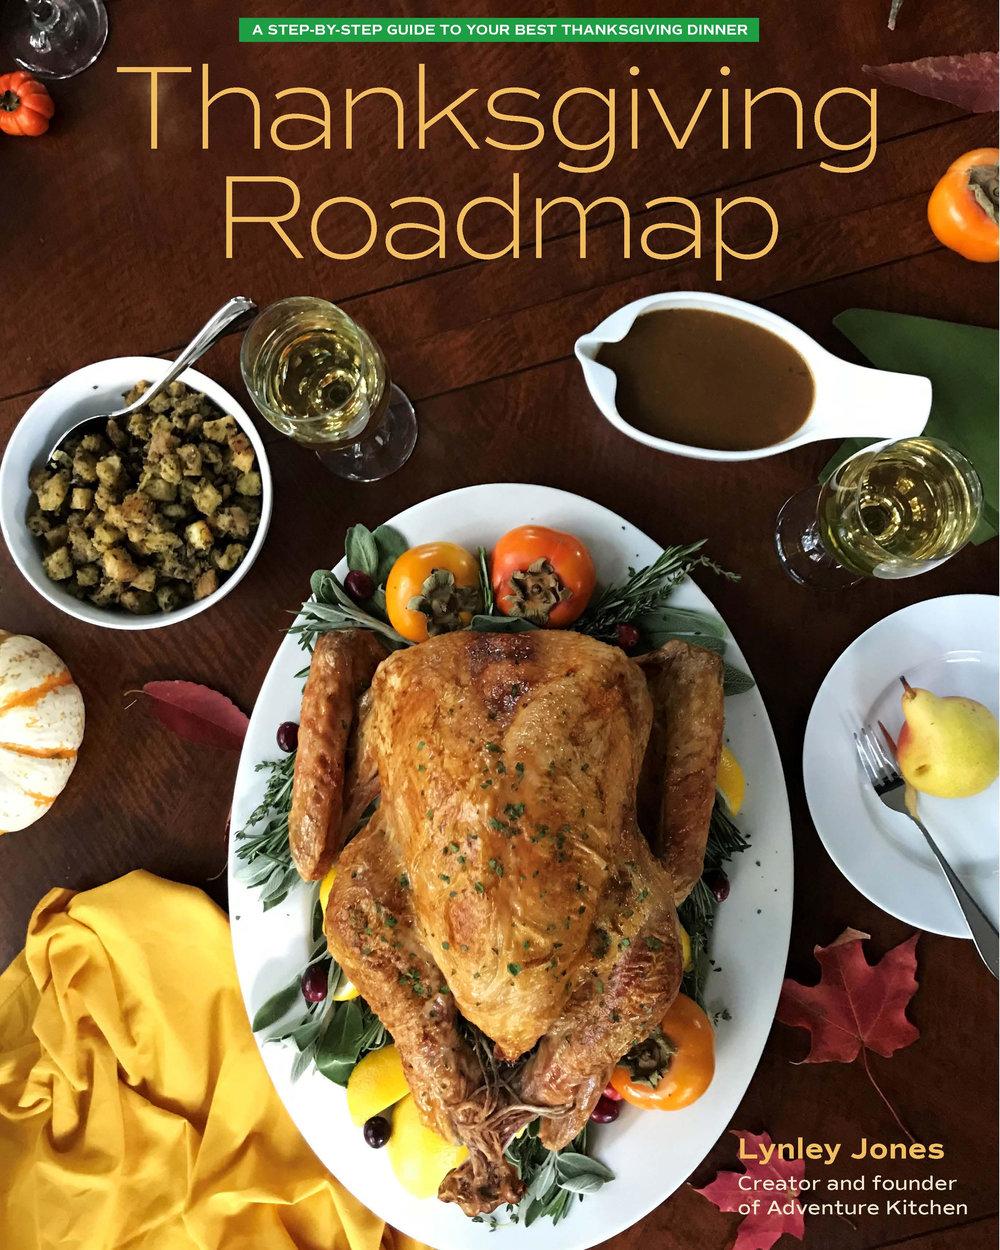 Thanksgiving Roadmap Front Cover.jpg